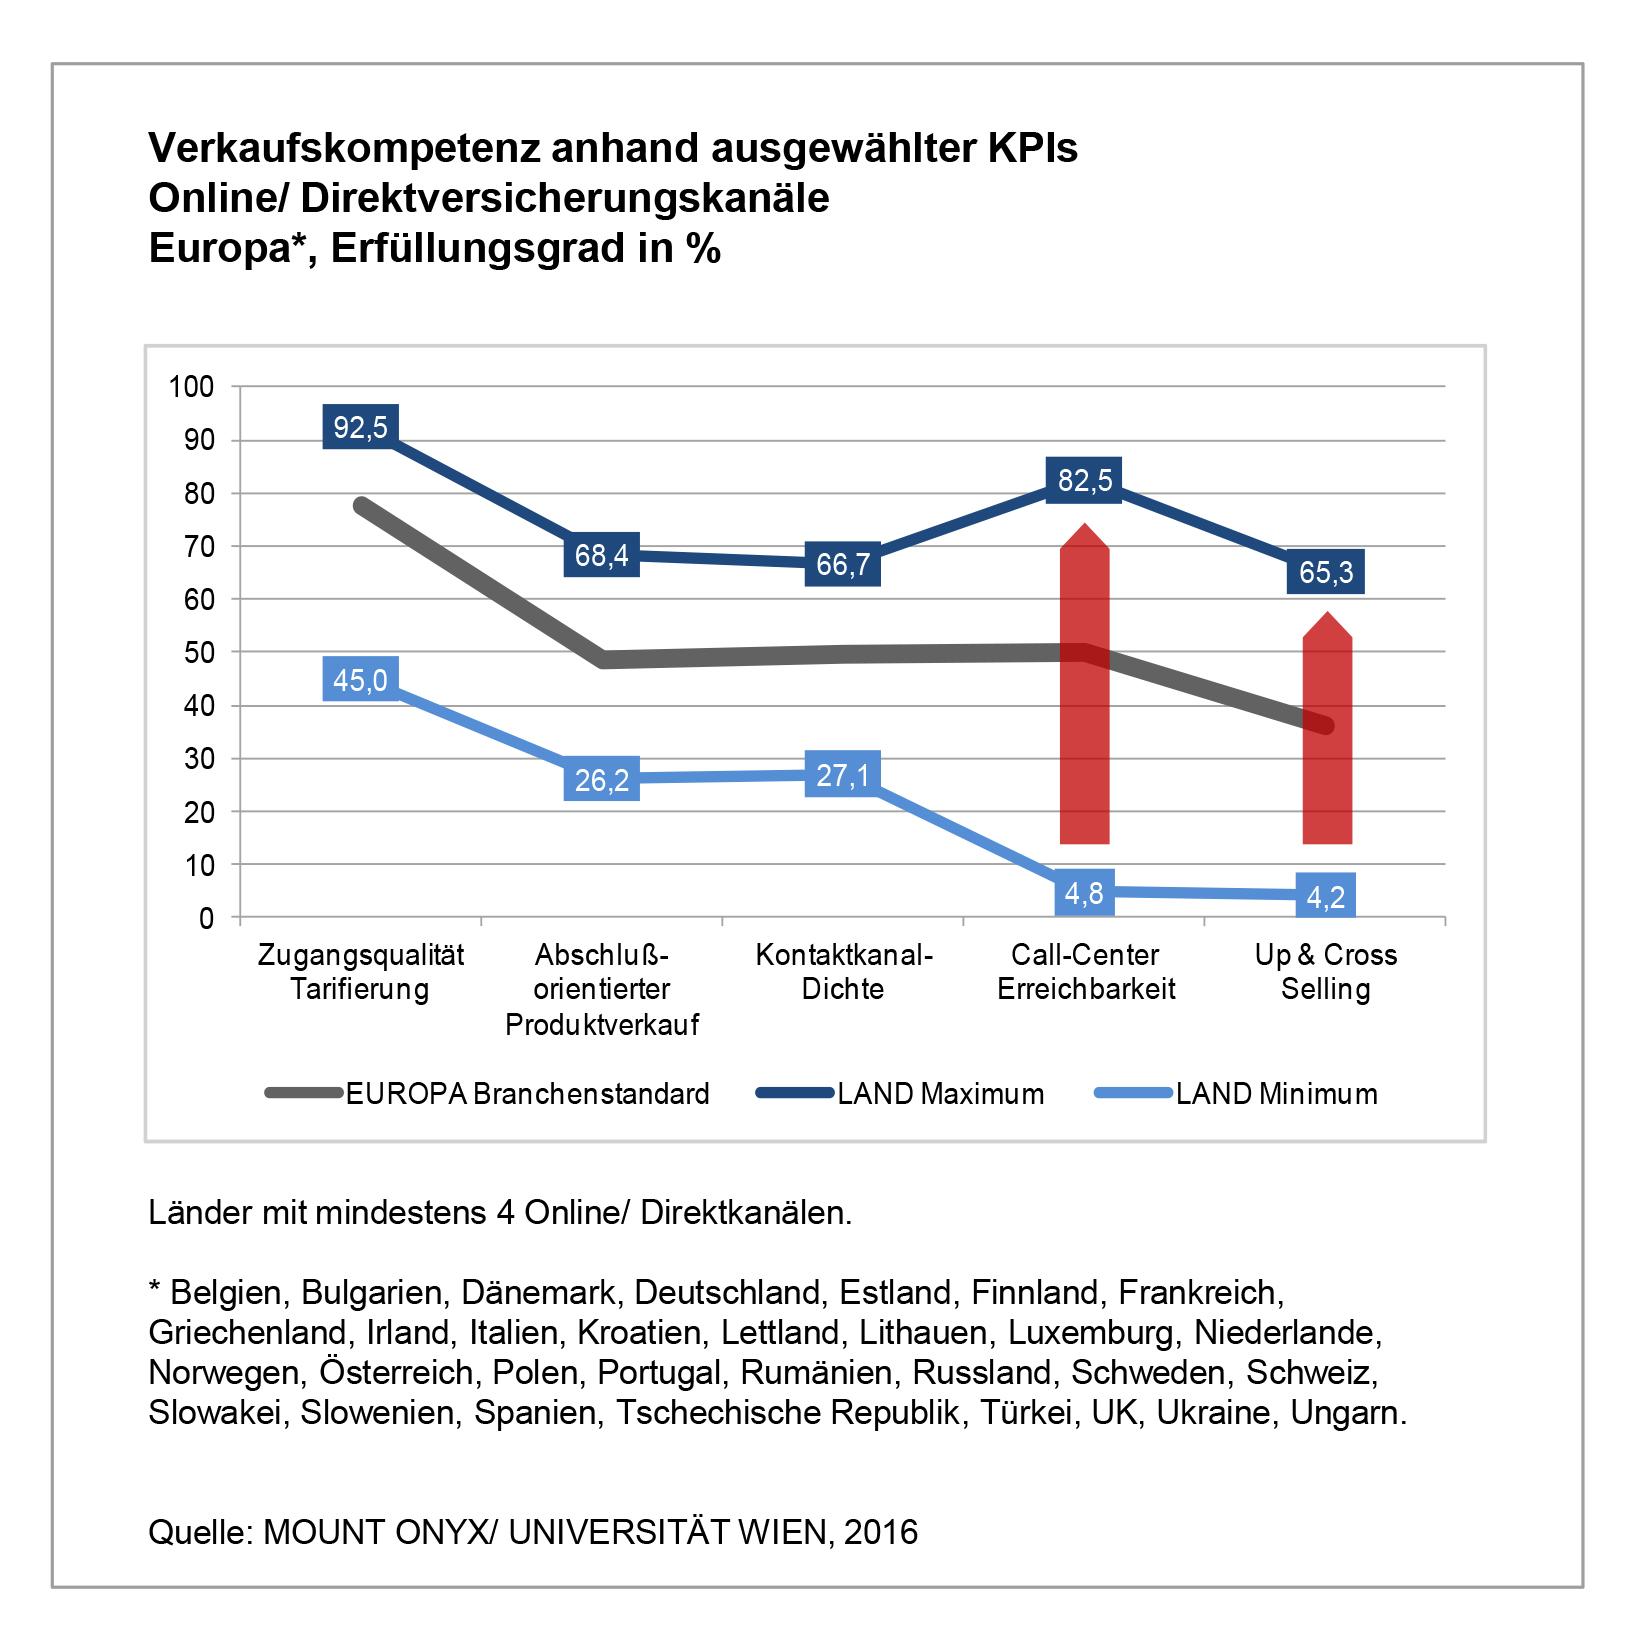 finsinger-ospald-abbildungsgrafik1-2016